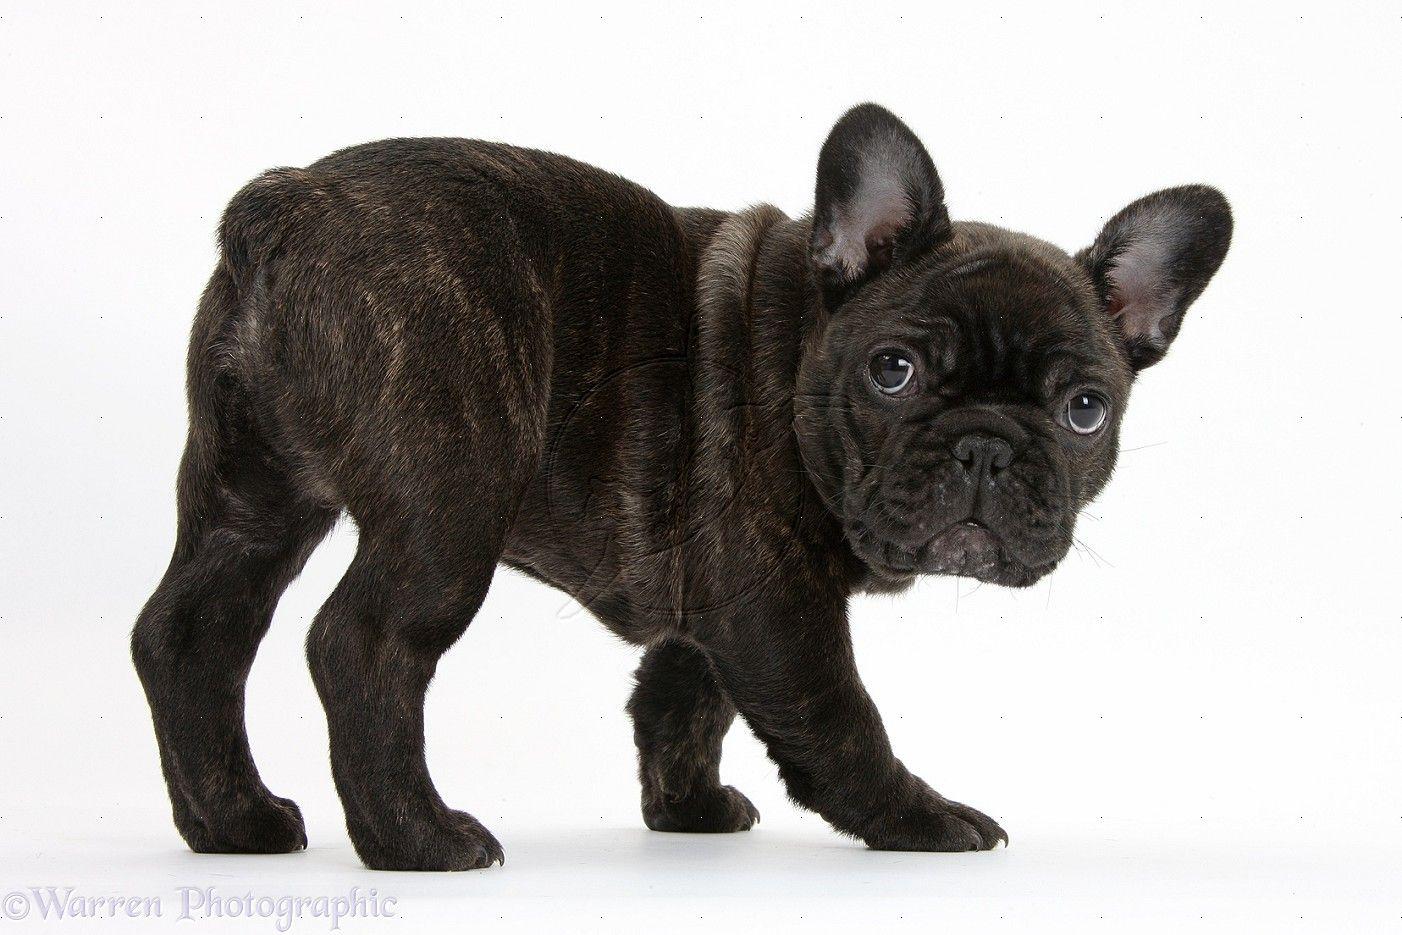 Dark Brindle French Bulldog Pup Photo Brindle French Bulldog French Bulldog Puppies French Bulldog